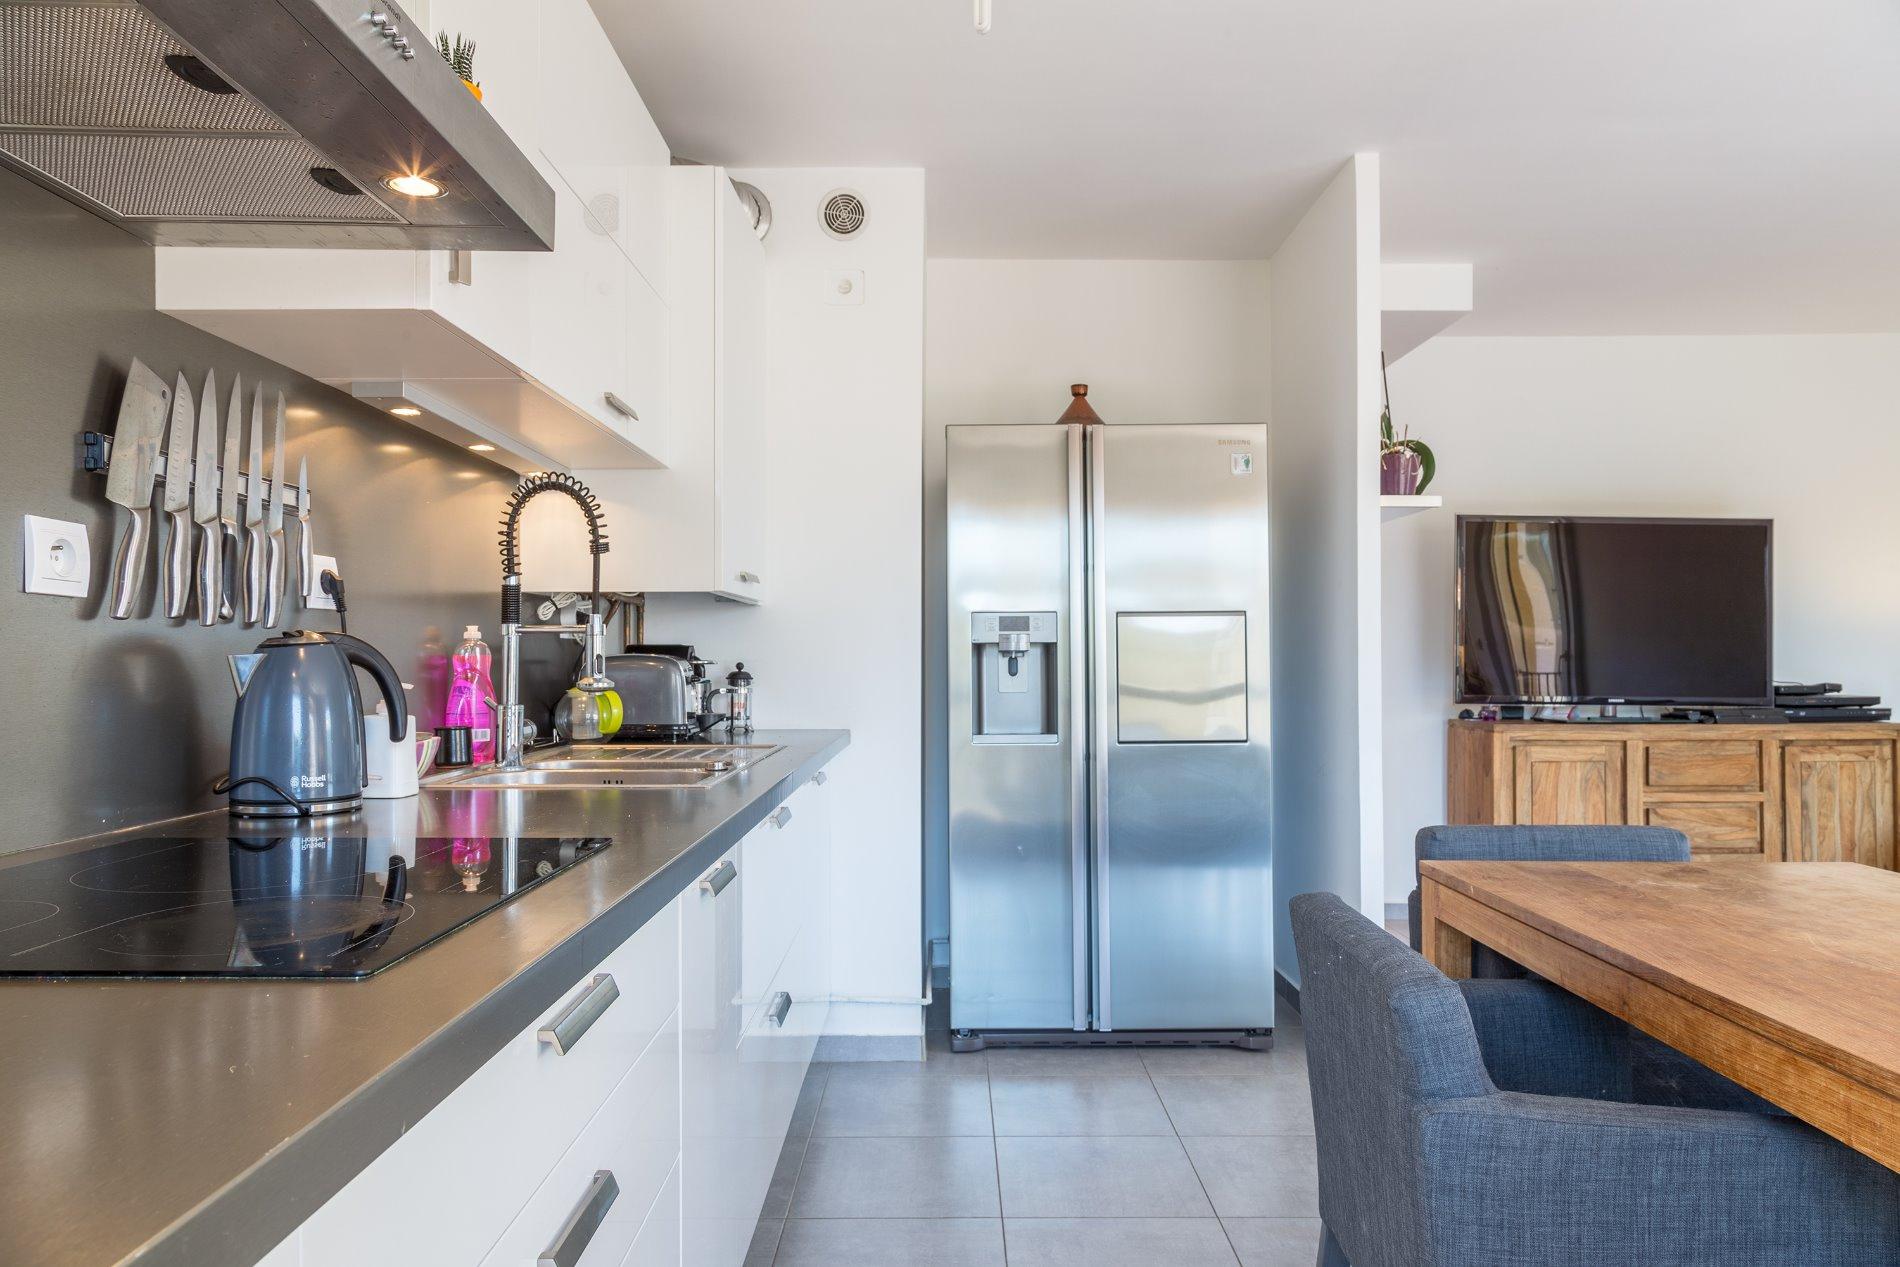 annonce vente appartement aubagne 13400 83 m 204 400 992738374308. Black Bedroom Furniture Sets. Home Design Ideas